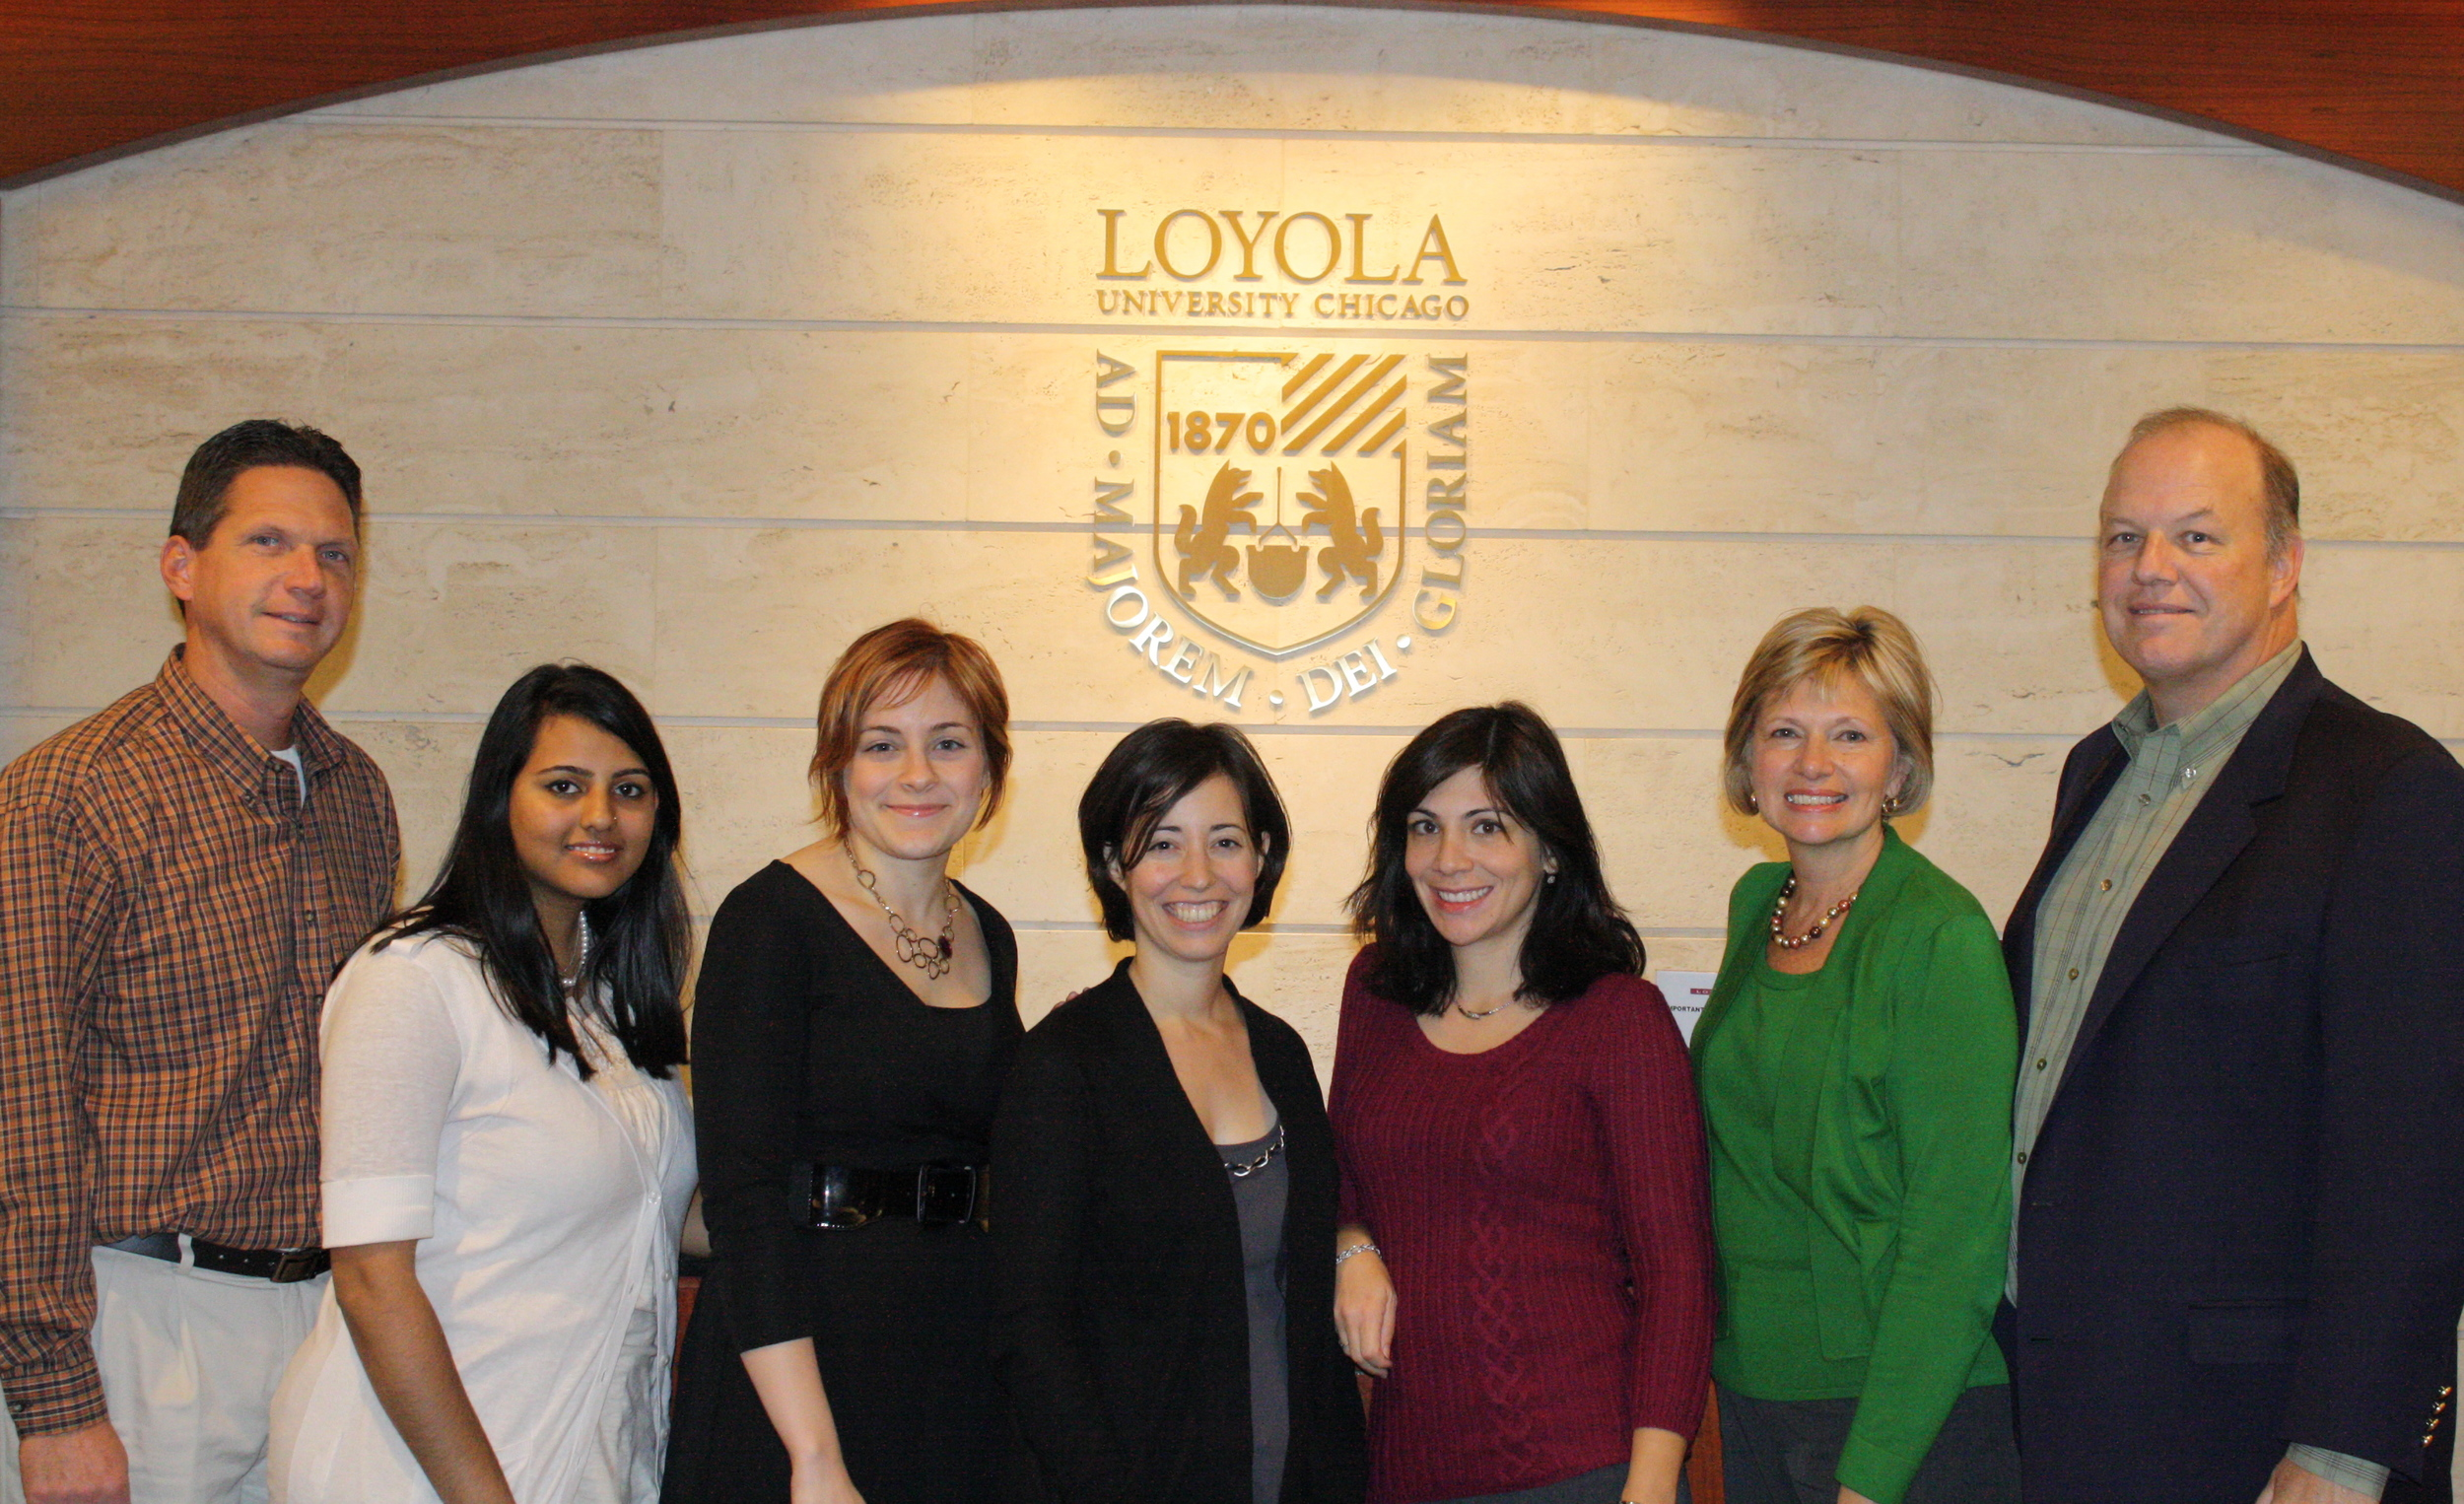 Loyola University Chicago alumni